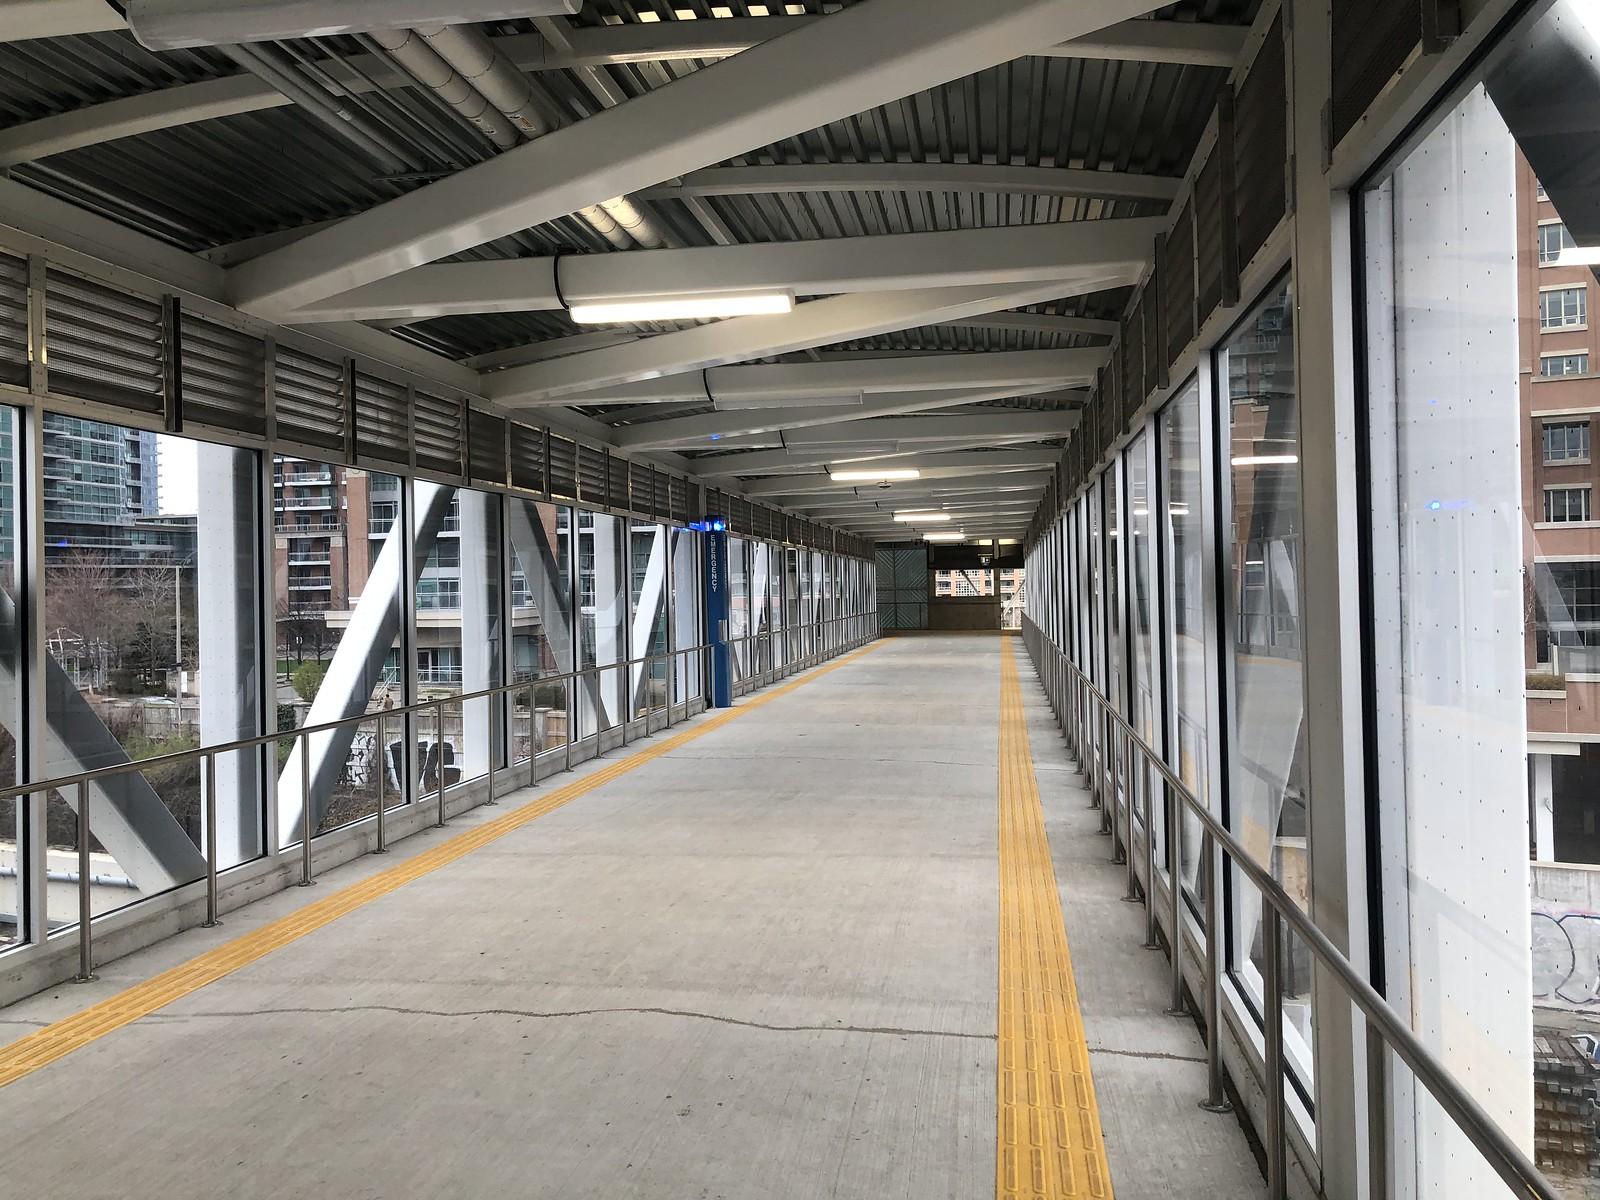 Inside the King-Liberty Pedestrian/Cycle Bridge